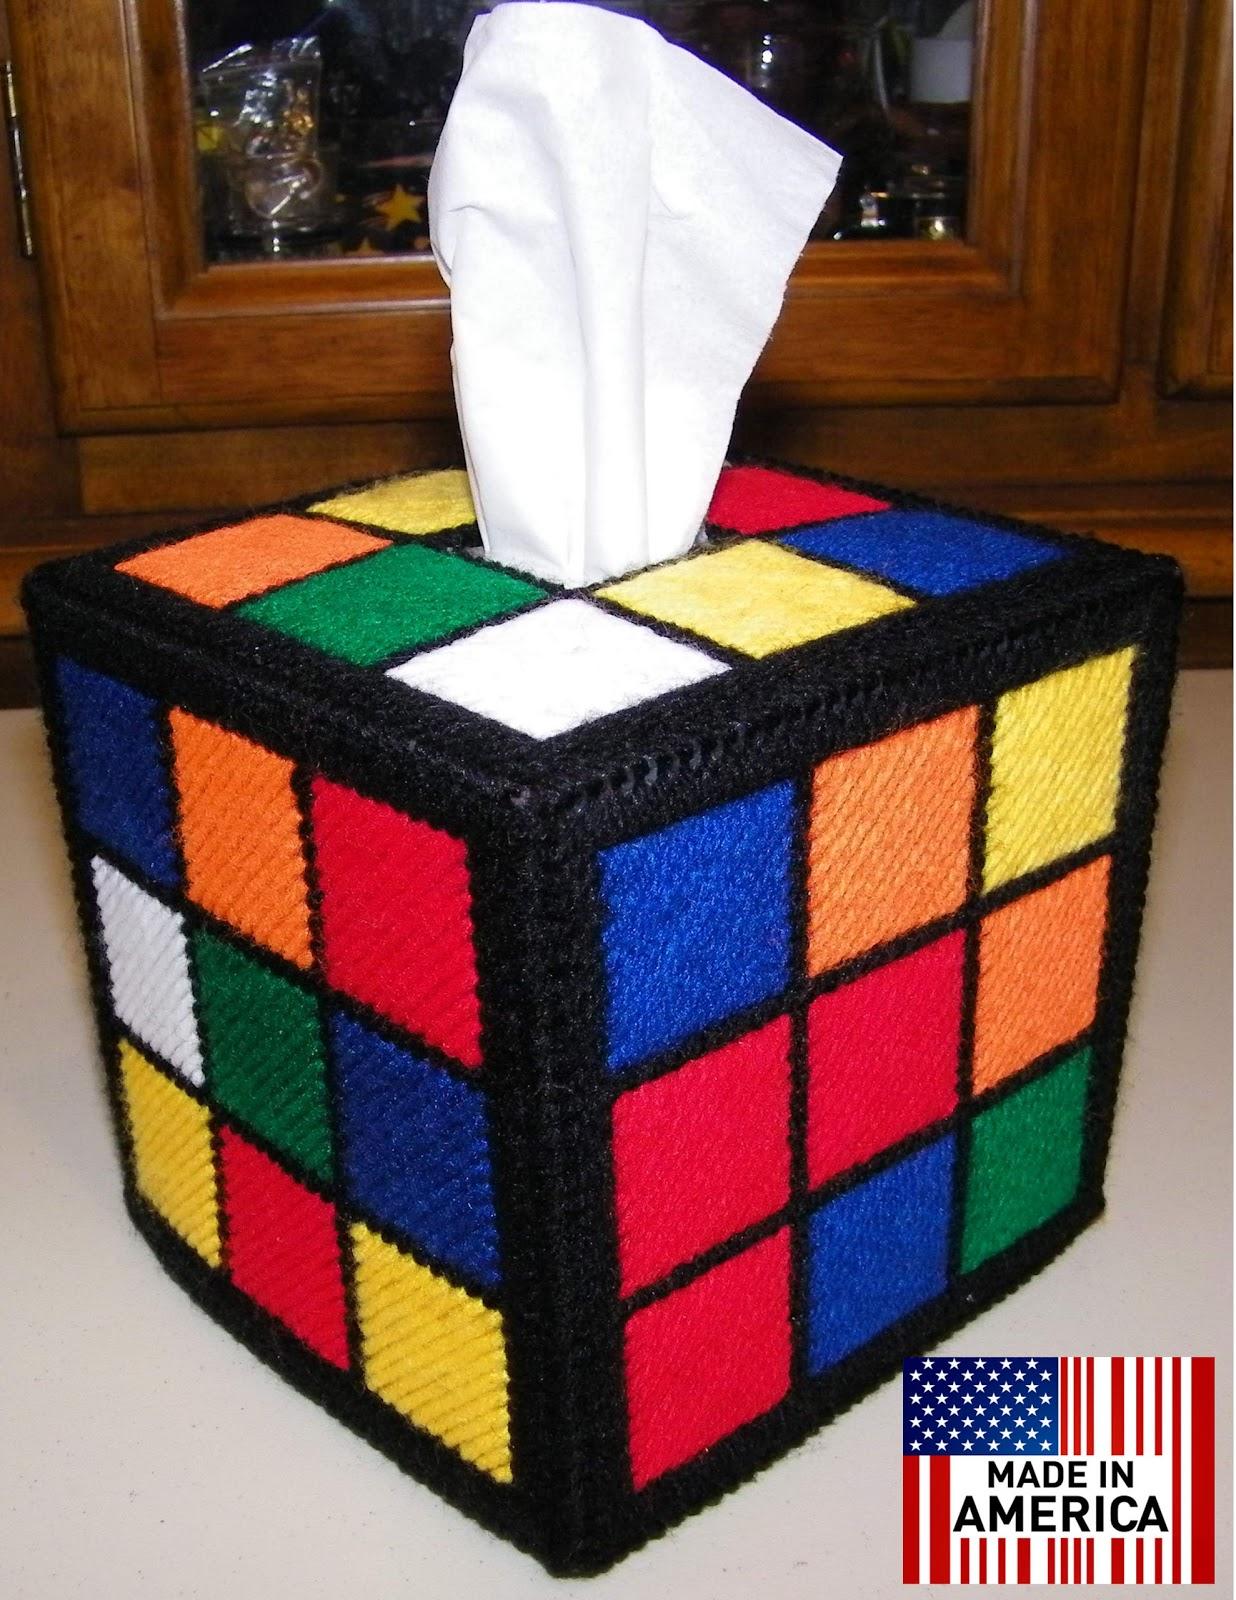 The Handmade Rubiks Cube Tissue Box Cover Rubik 39 S Rubiks